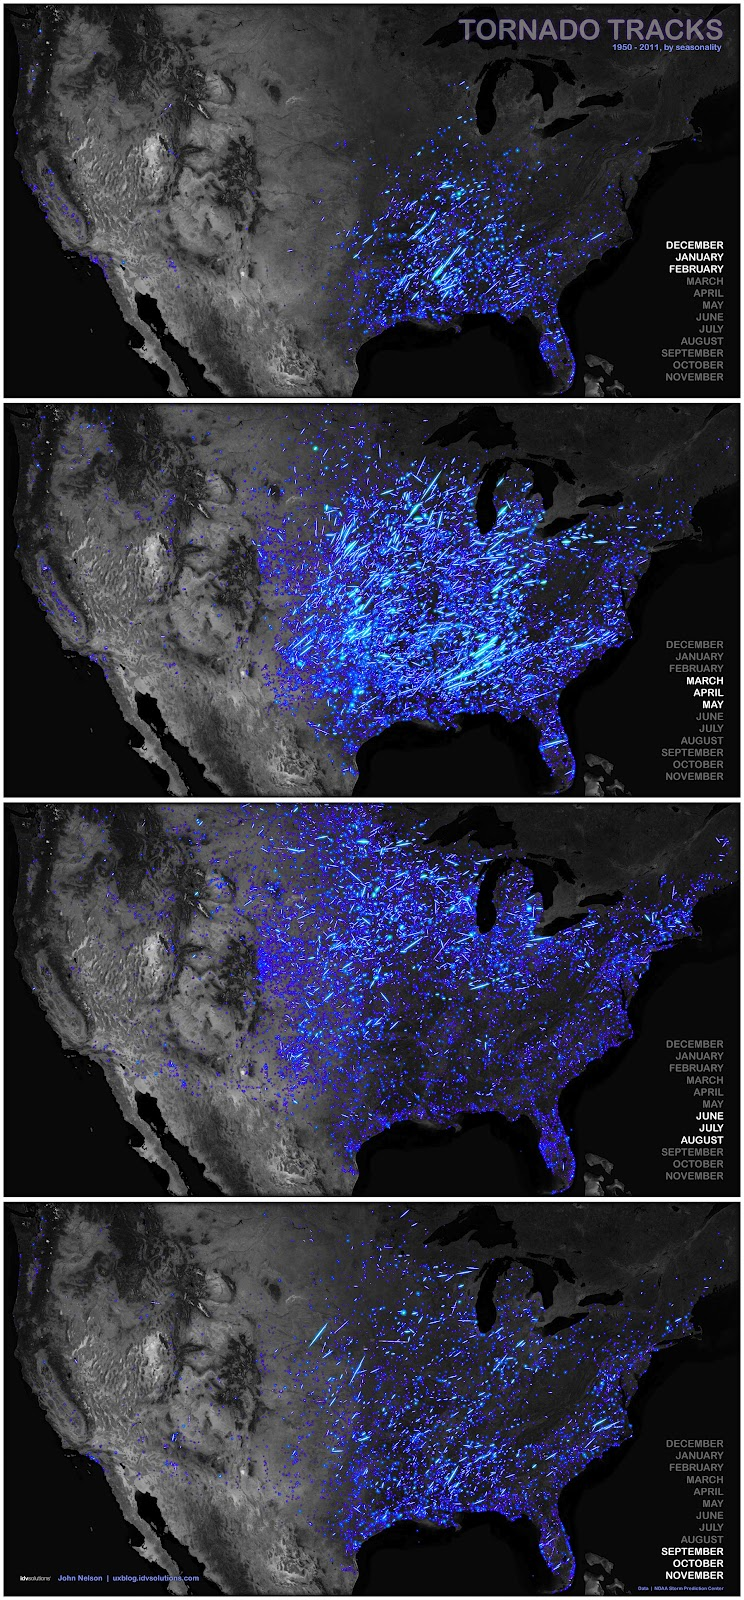 Interactive Tornado Tracks Map Is Live